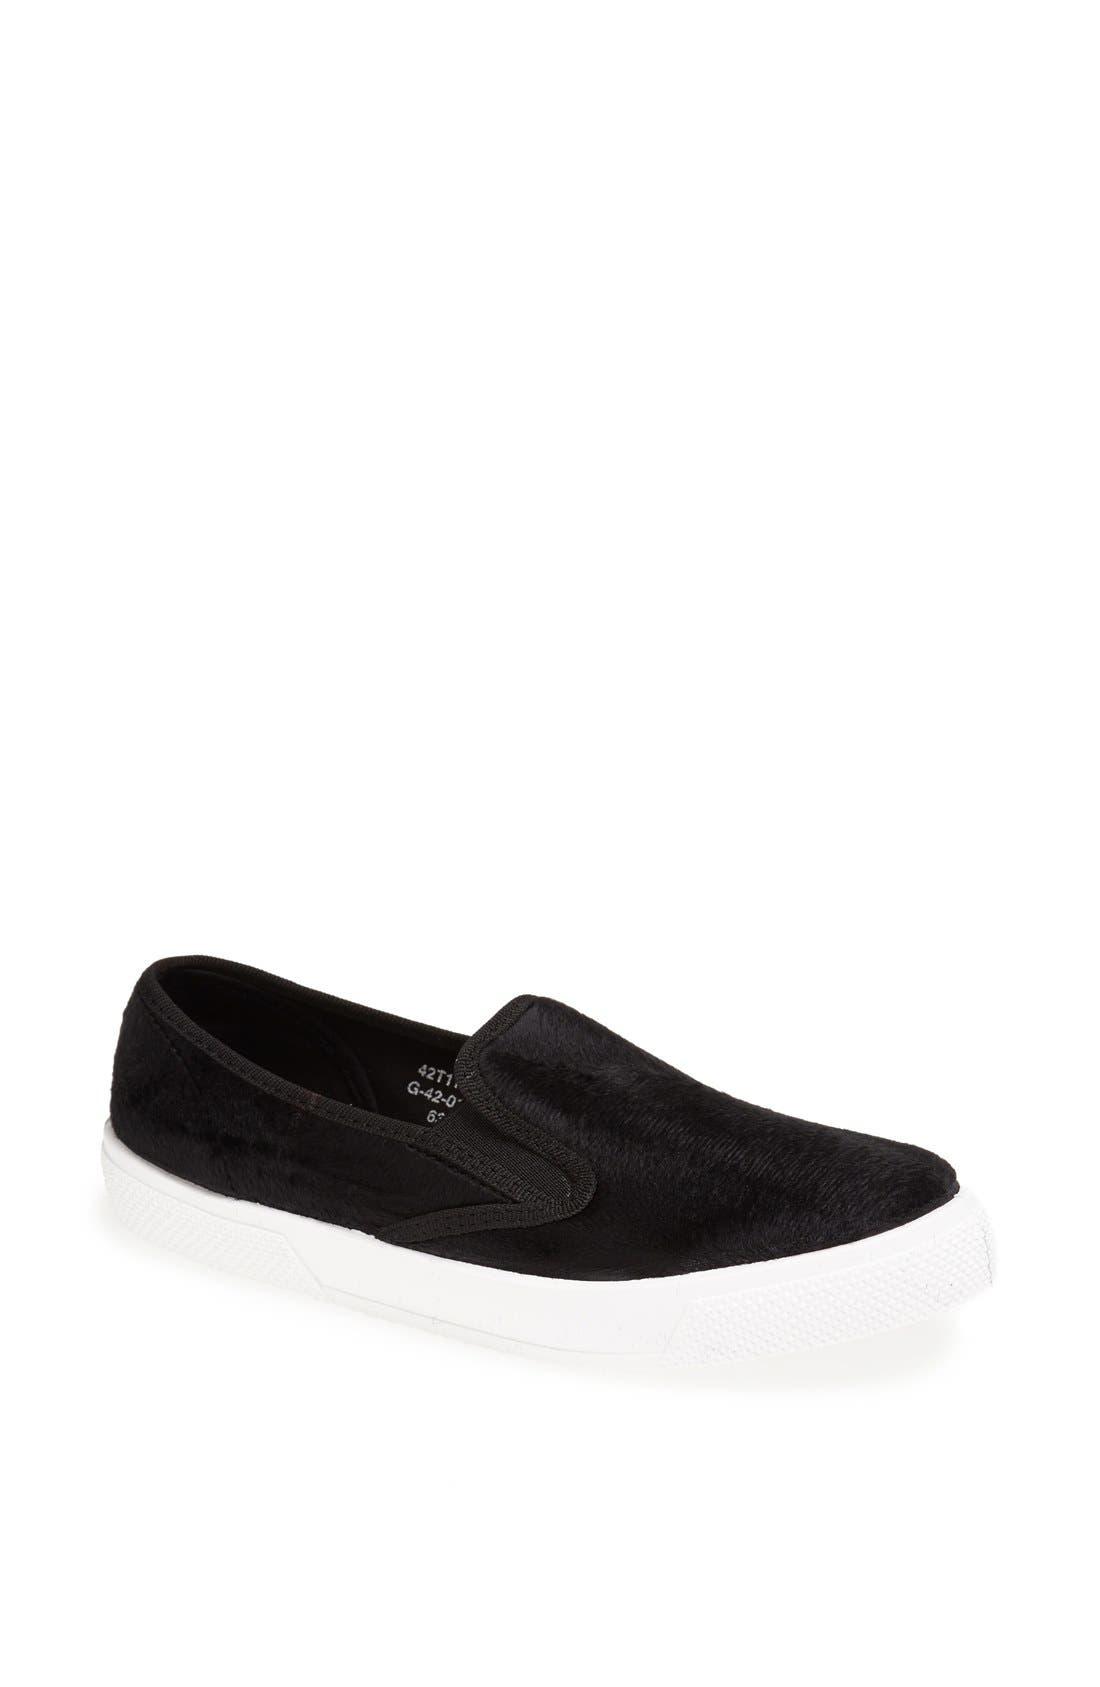 Main Image - Topshop 'Tika 2' Slip On Sneaker